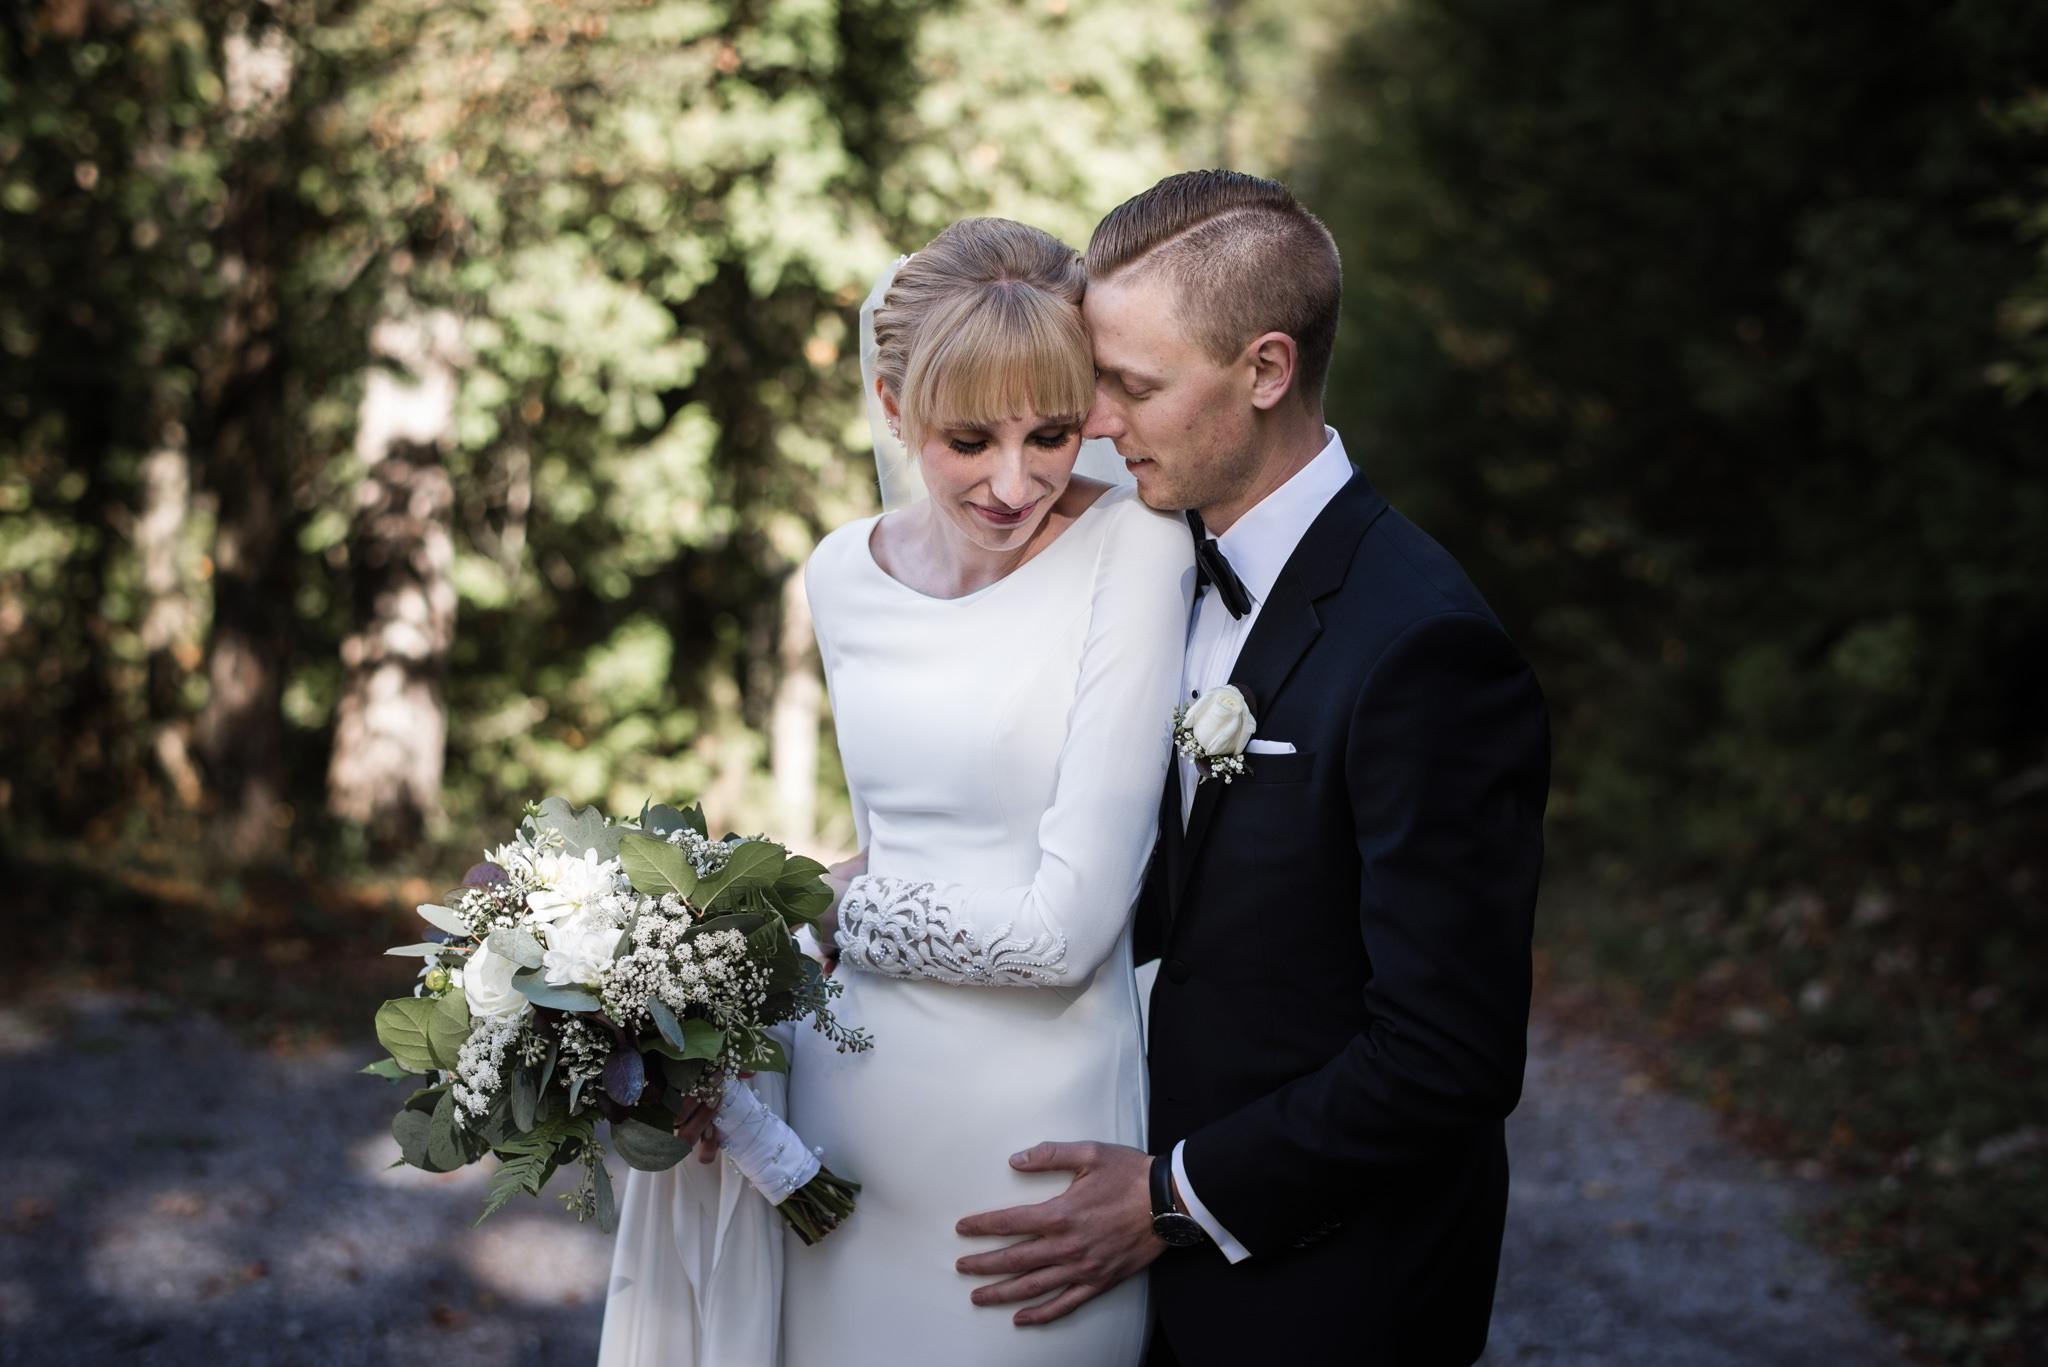 051-wedding-photos-in-forest-ontario-cottage-toronto.jpg